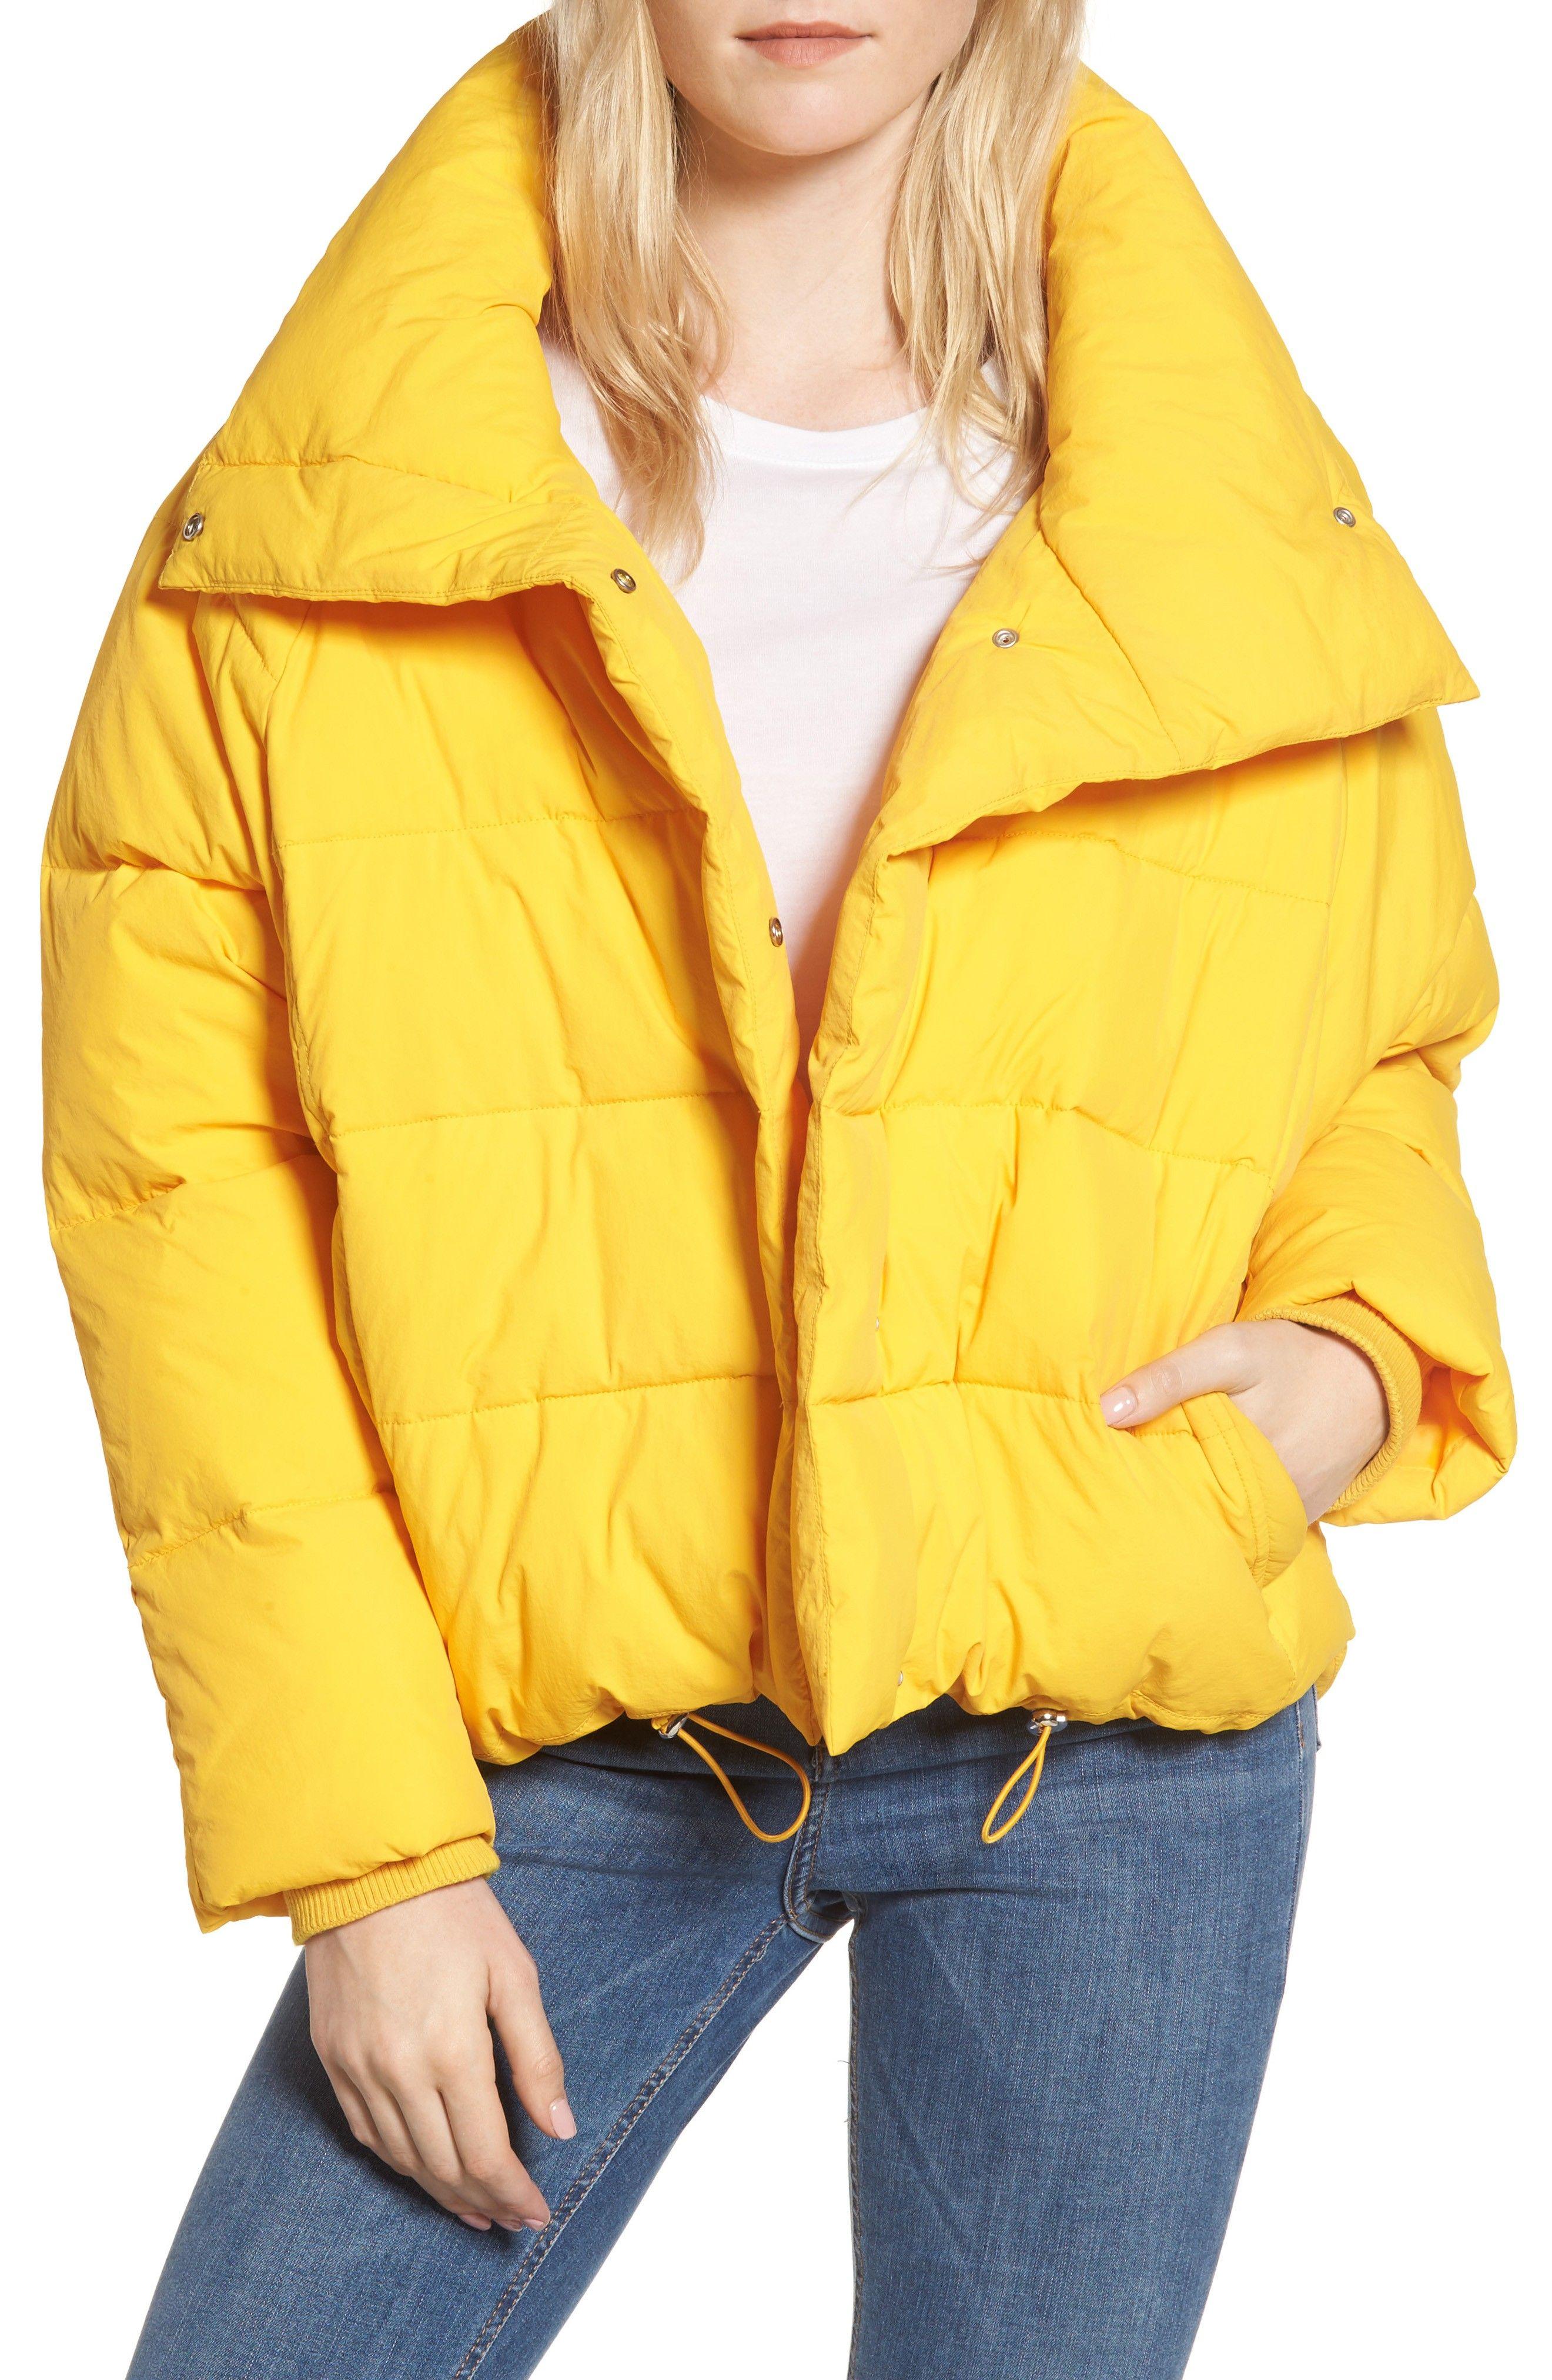 Oversized Puffer Coat Puffer Coat Women S Puffer Coats Best Puffer Jacket [ 4048 x 2640 Pixel ]